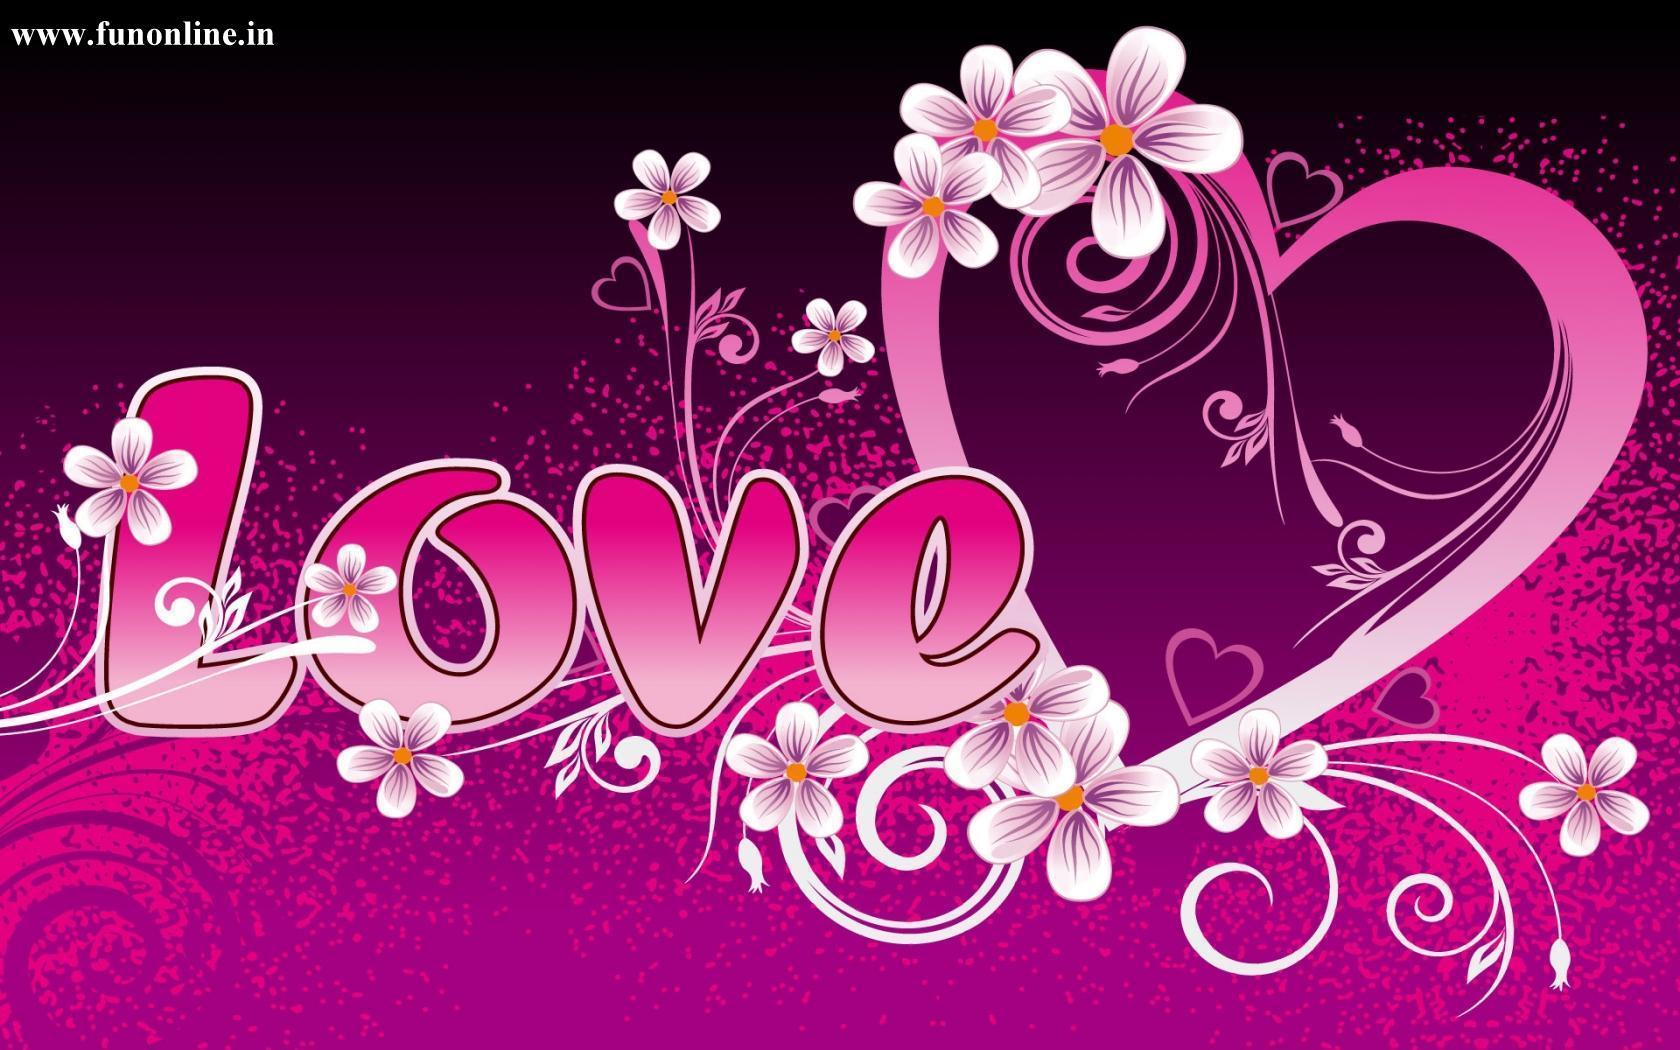 Love Heart Wallpapers Loving Hearts Cute Love Wallpapers Love Poem 1680x1050